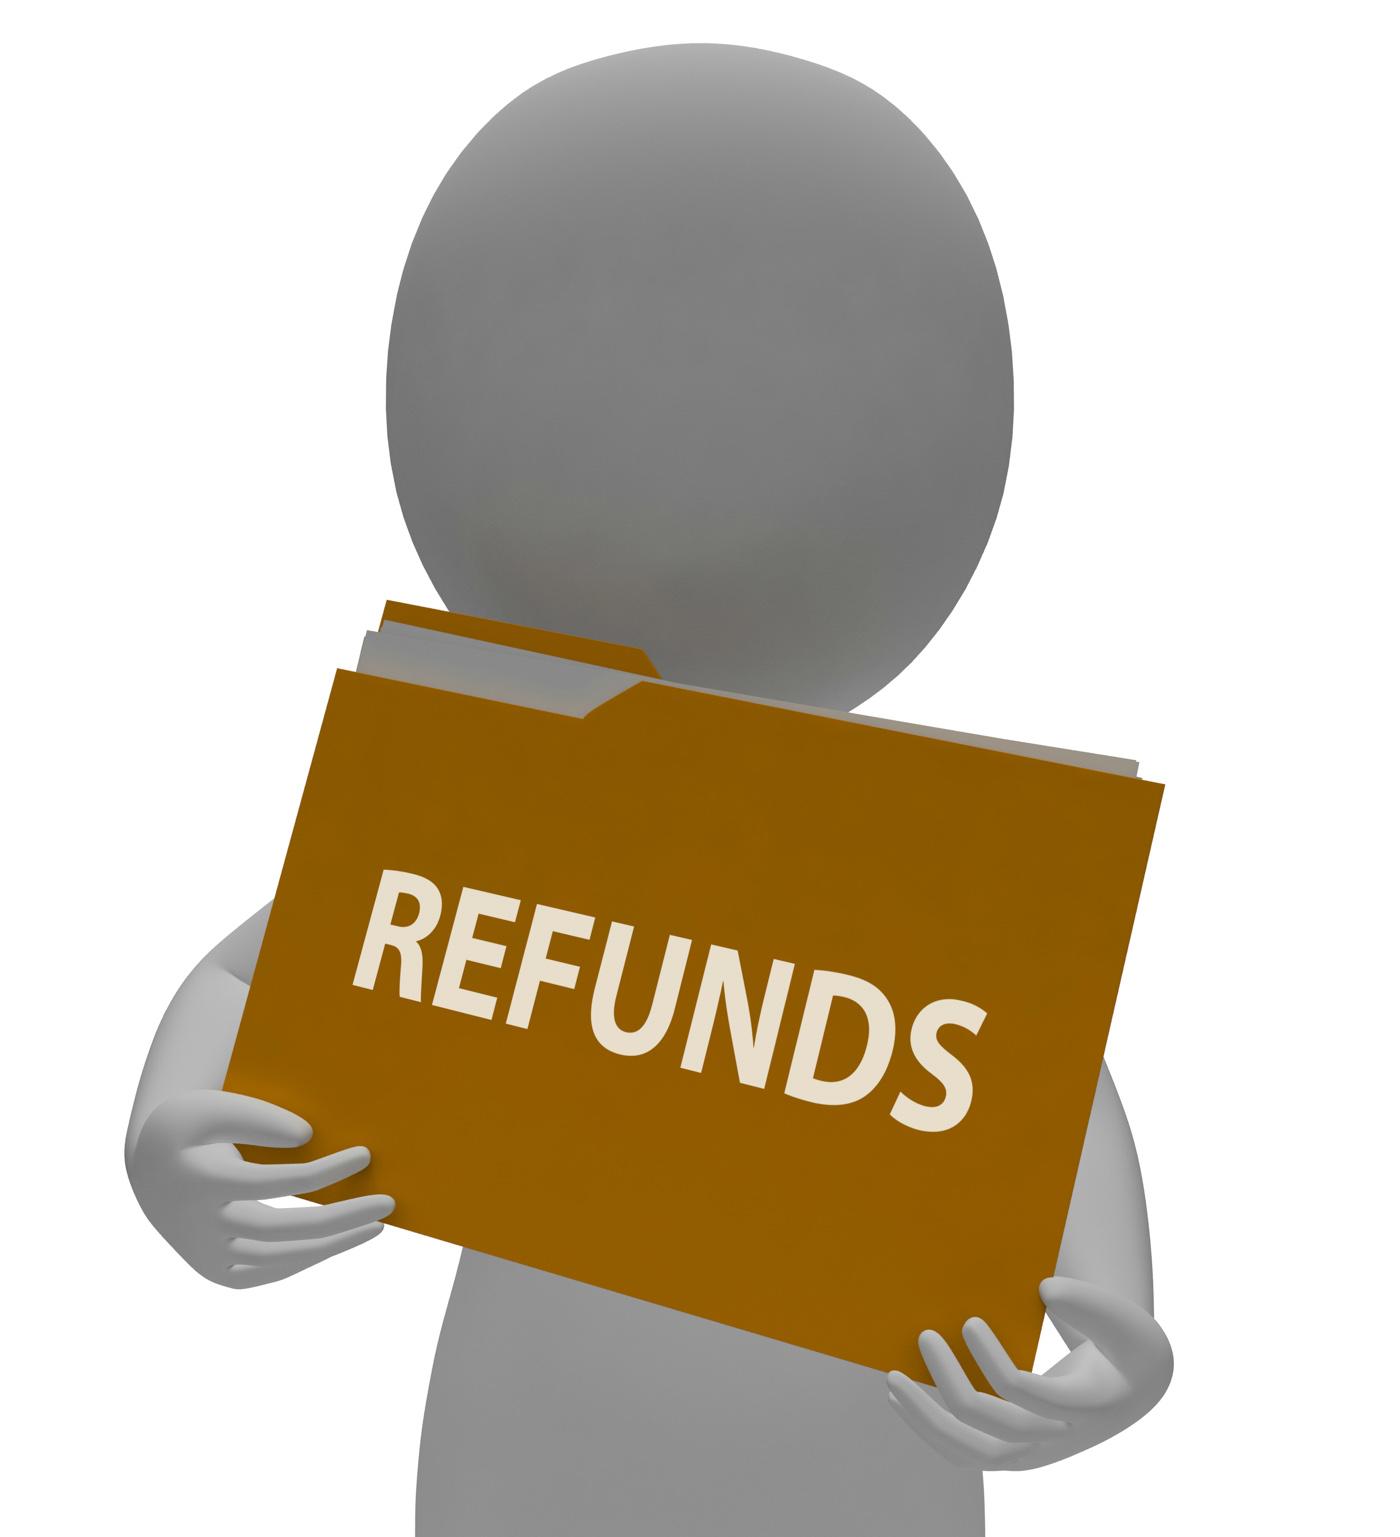 Refunds Folder Means Money Back And Administration 3d Rendering, Organize, Repayment, Remuneration, Reimbursement, HQ Photo